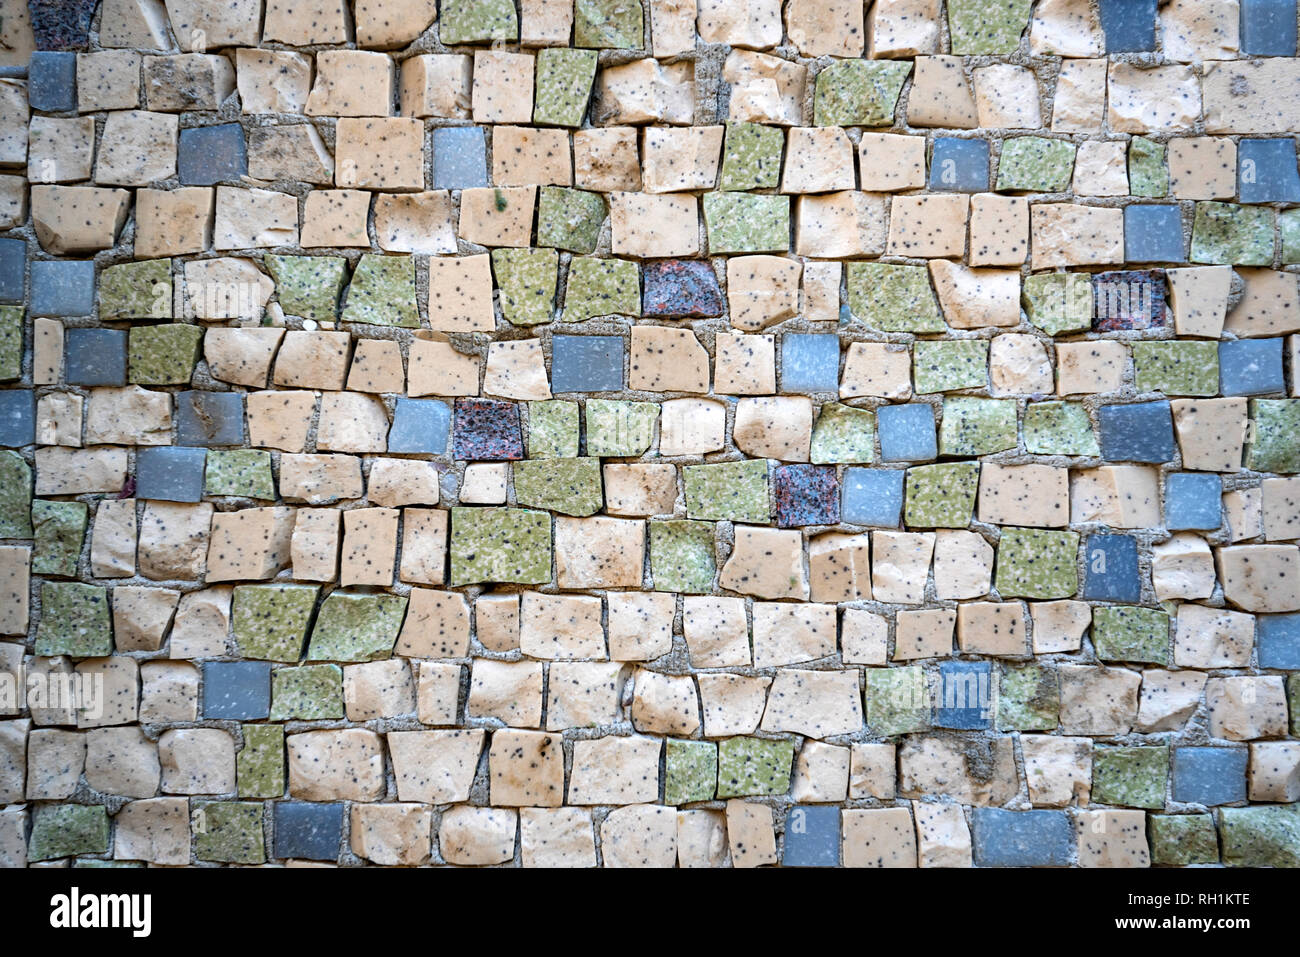 Close up piastrelle colorate in pietra texture a parete foto